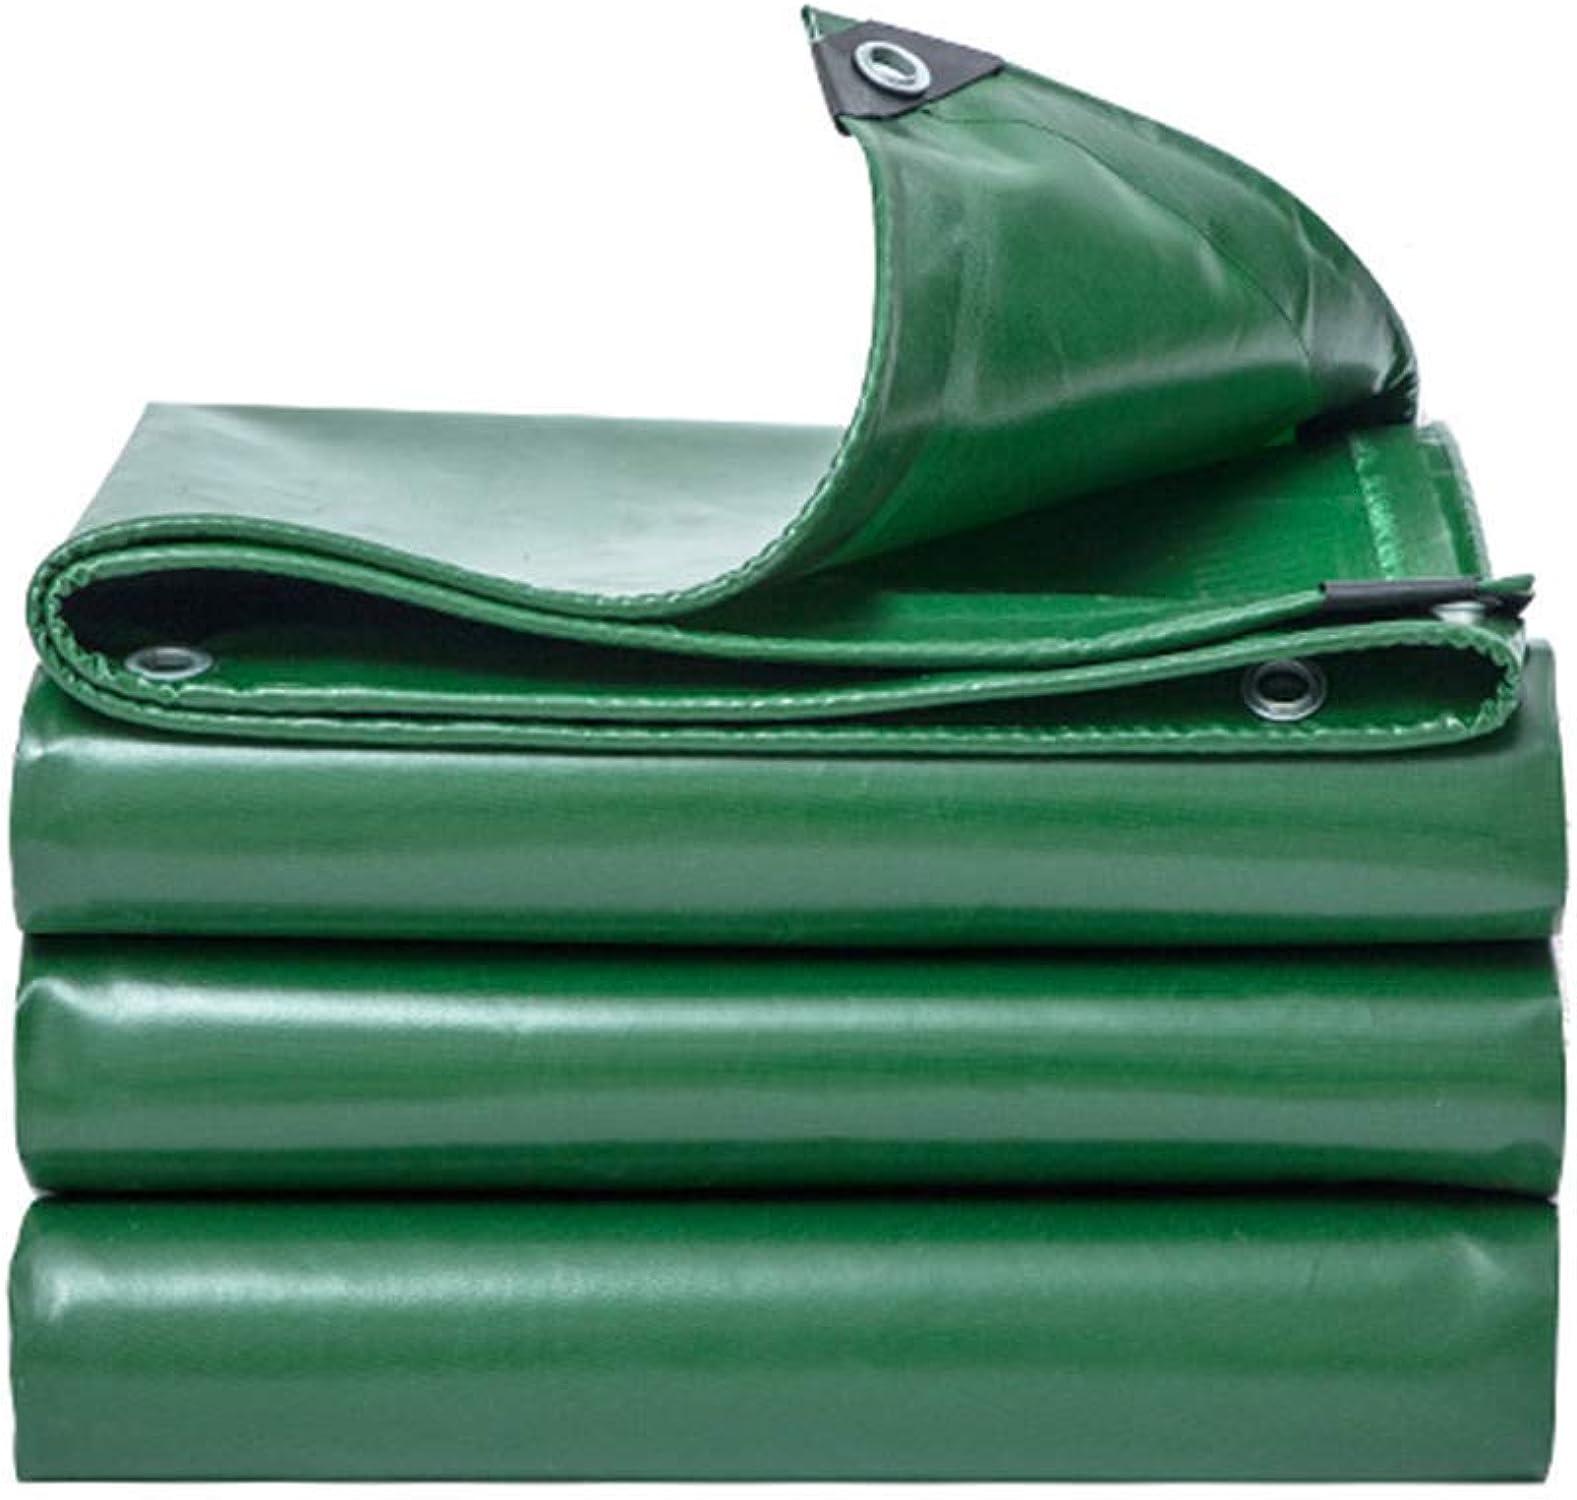 WHS Lonas para Trabajo Pesado Lona de PVC Impermeable para Uso Exterior para Acampar, Multiusos, Resistente a rasgaduras y rasgaduras, Aceite verde 530 g (Tamao   2m×2m)